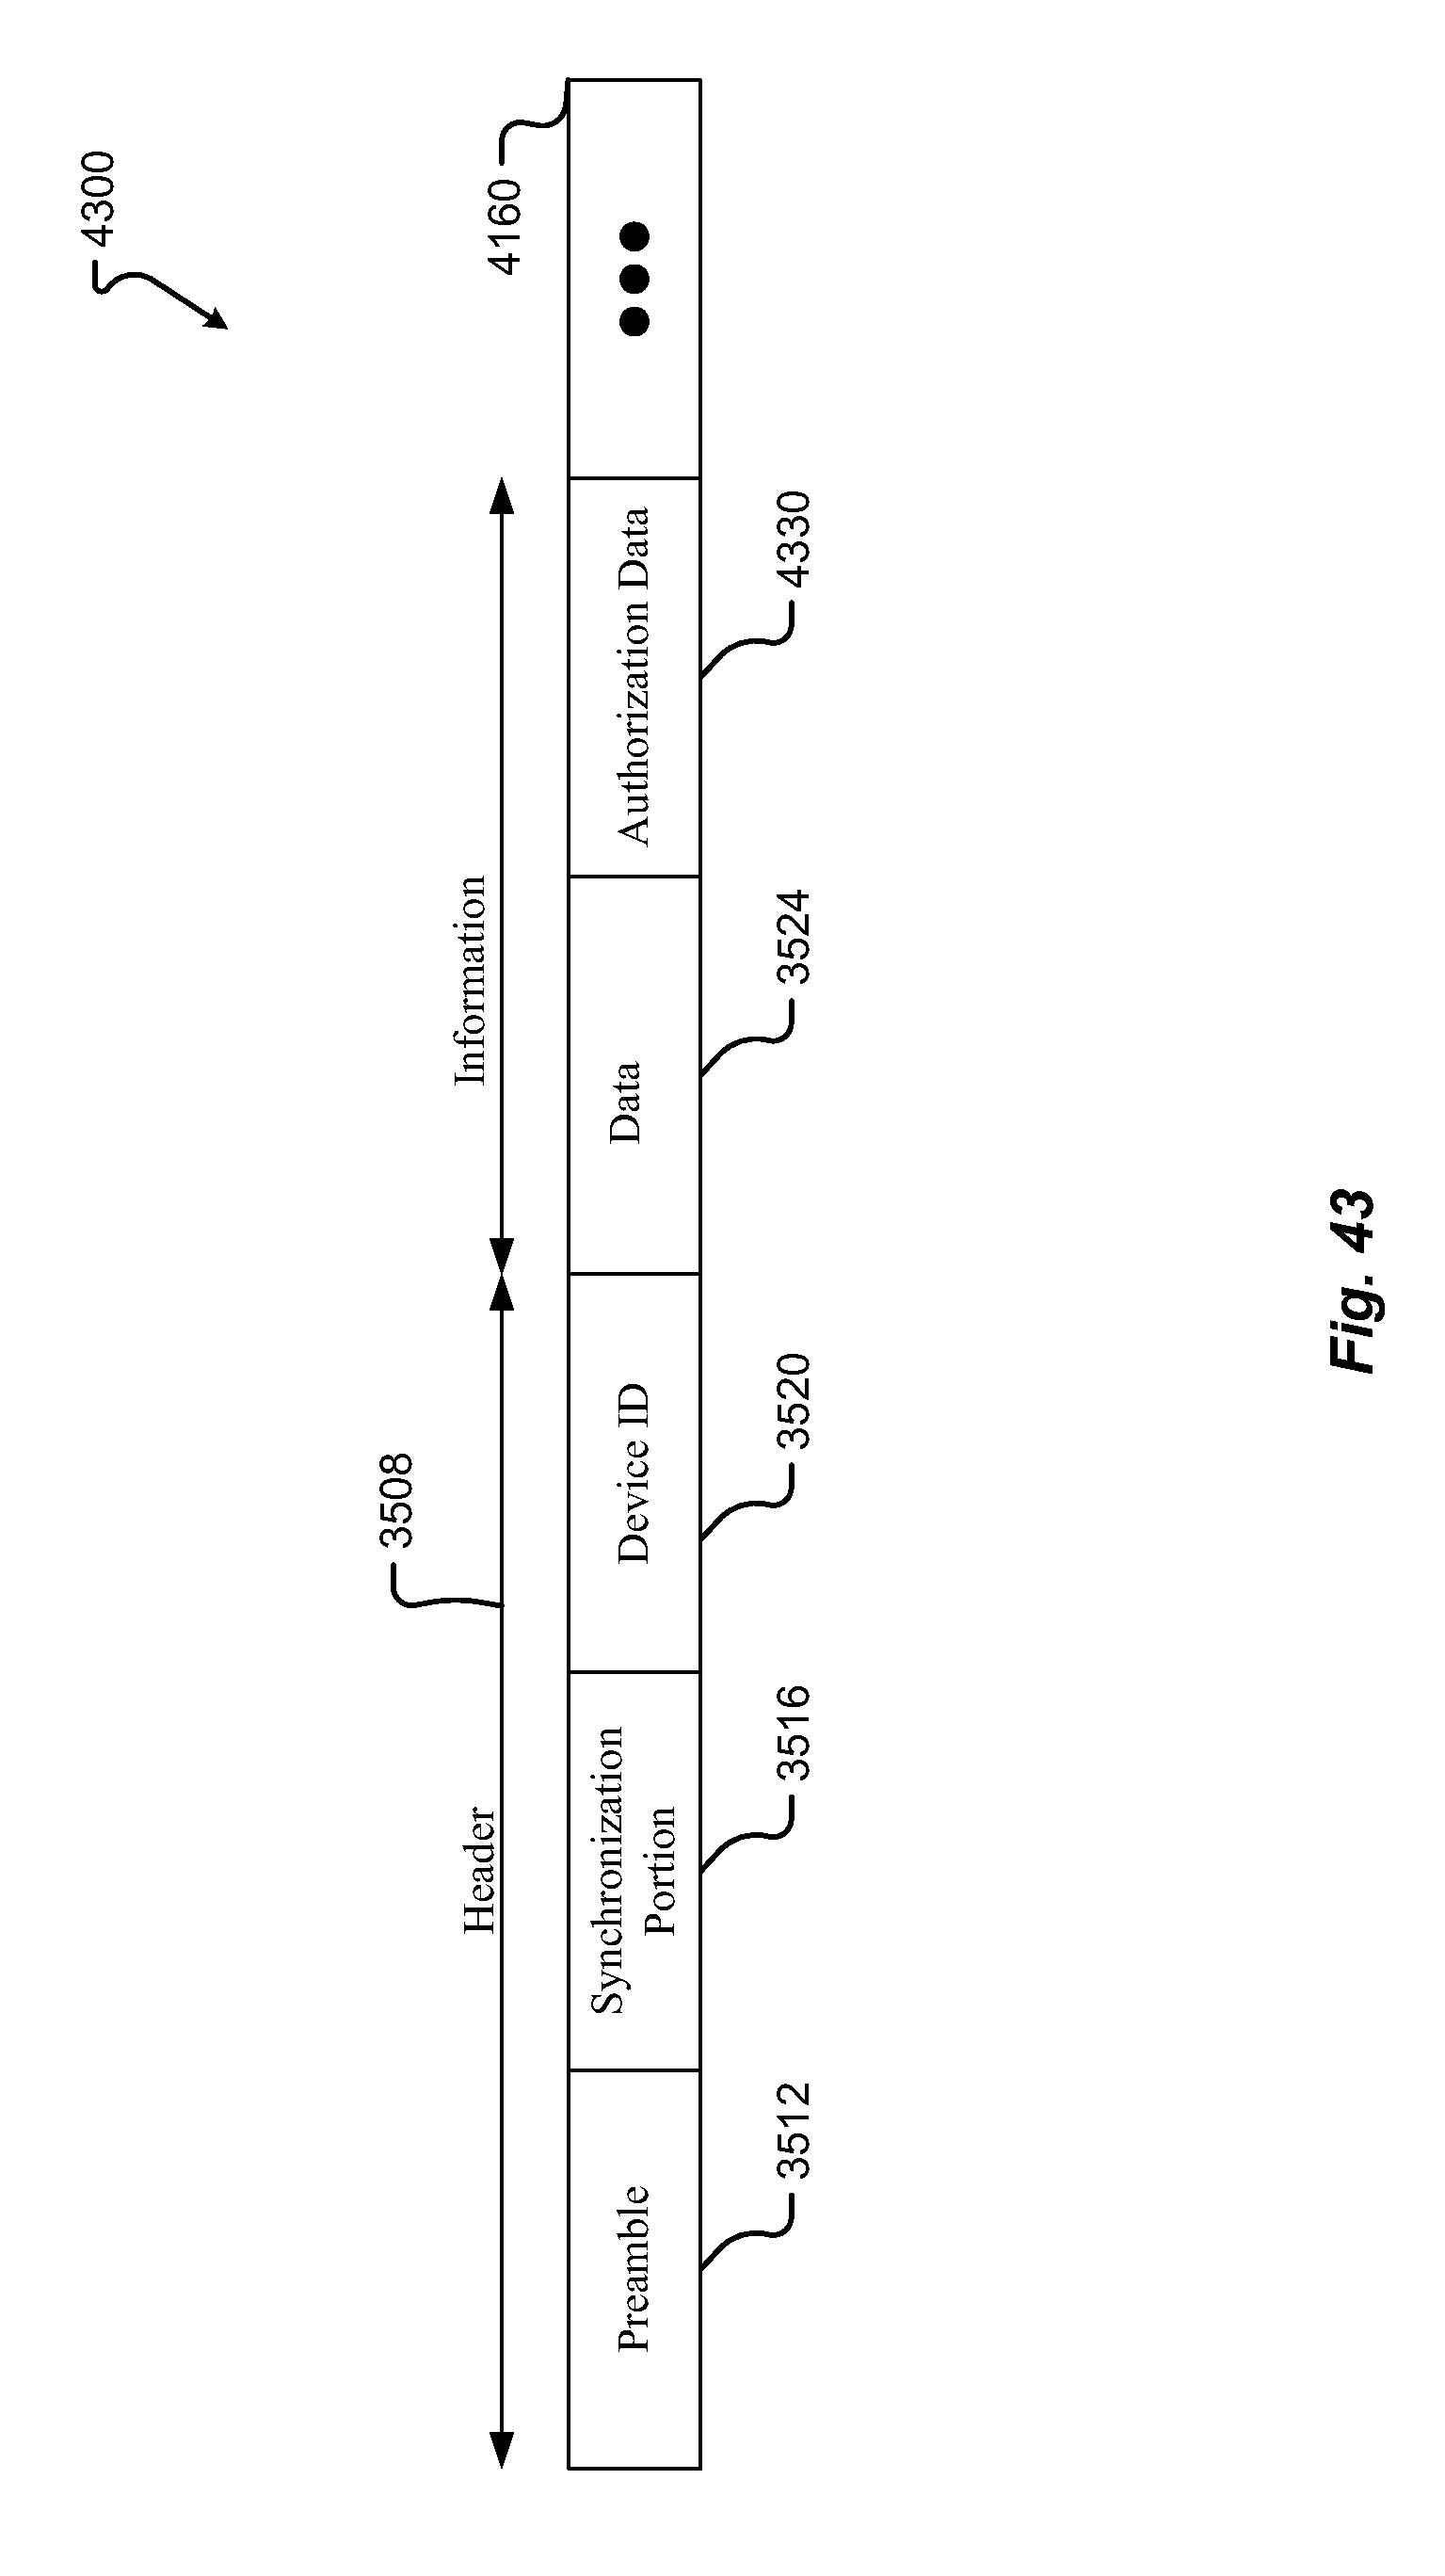 Patent US 9,646,439 B2